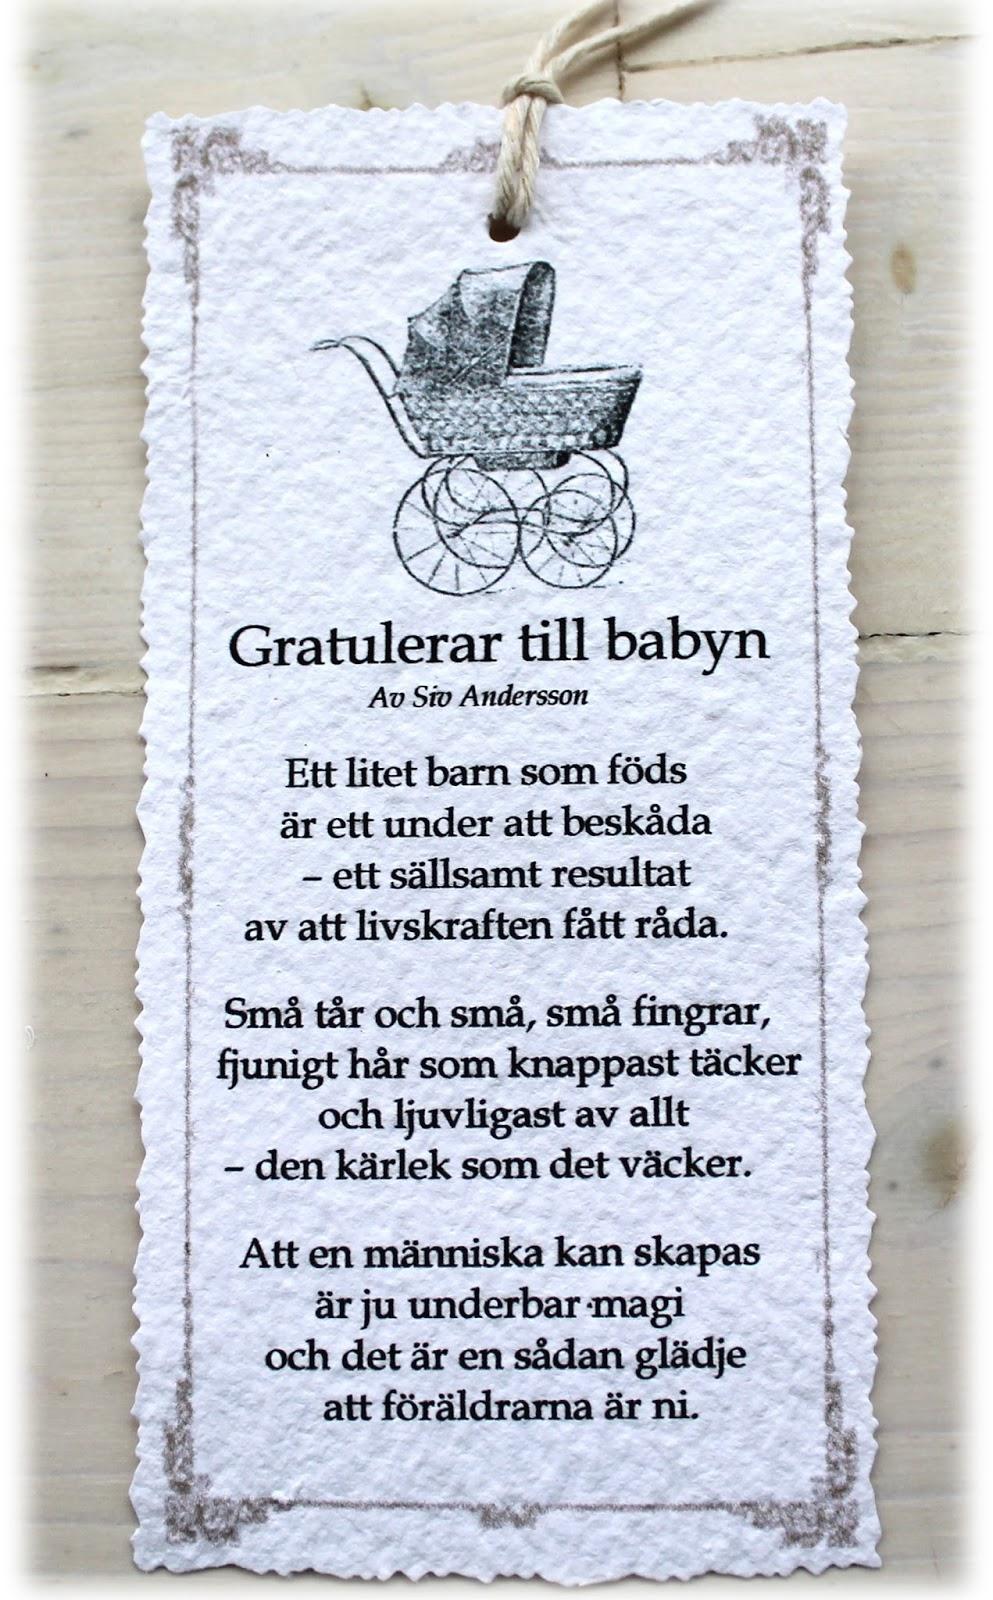 grattis till babyn text Annas idéer bloggbutik: september 2012 grattis till babyn text